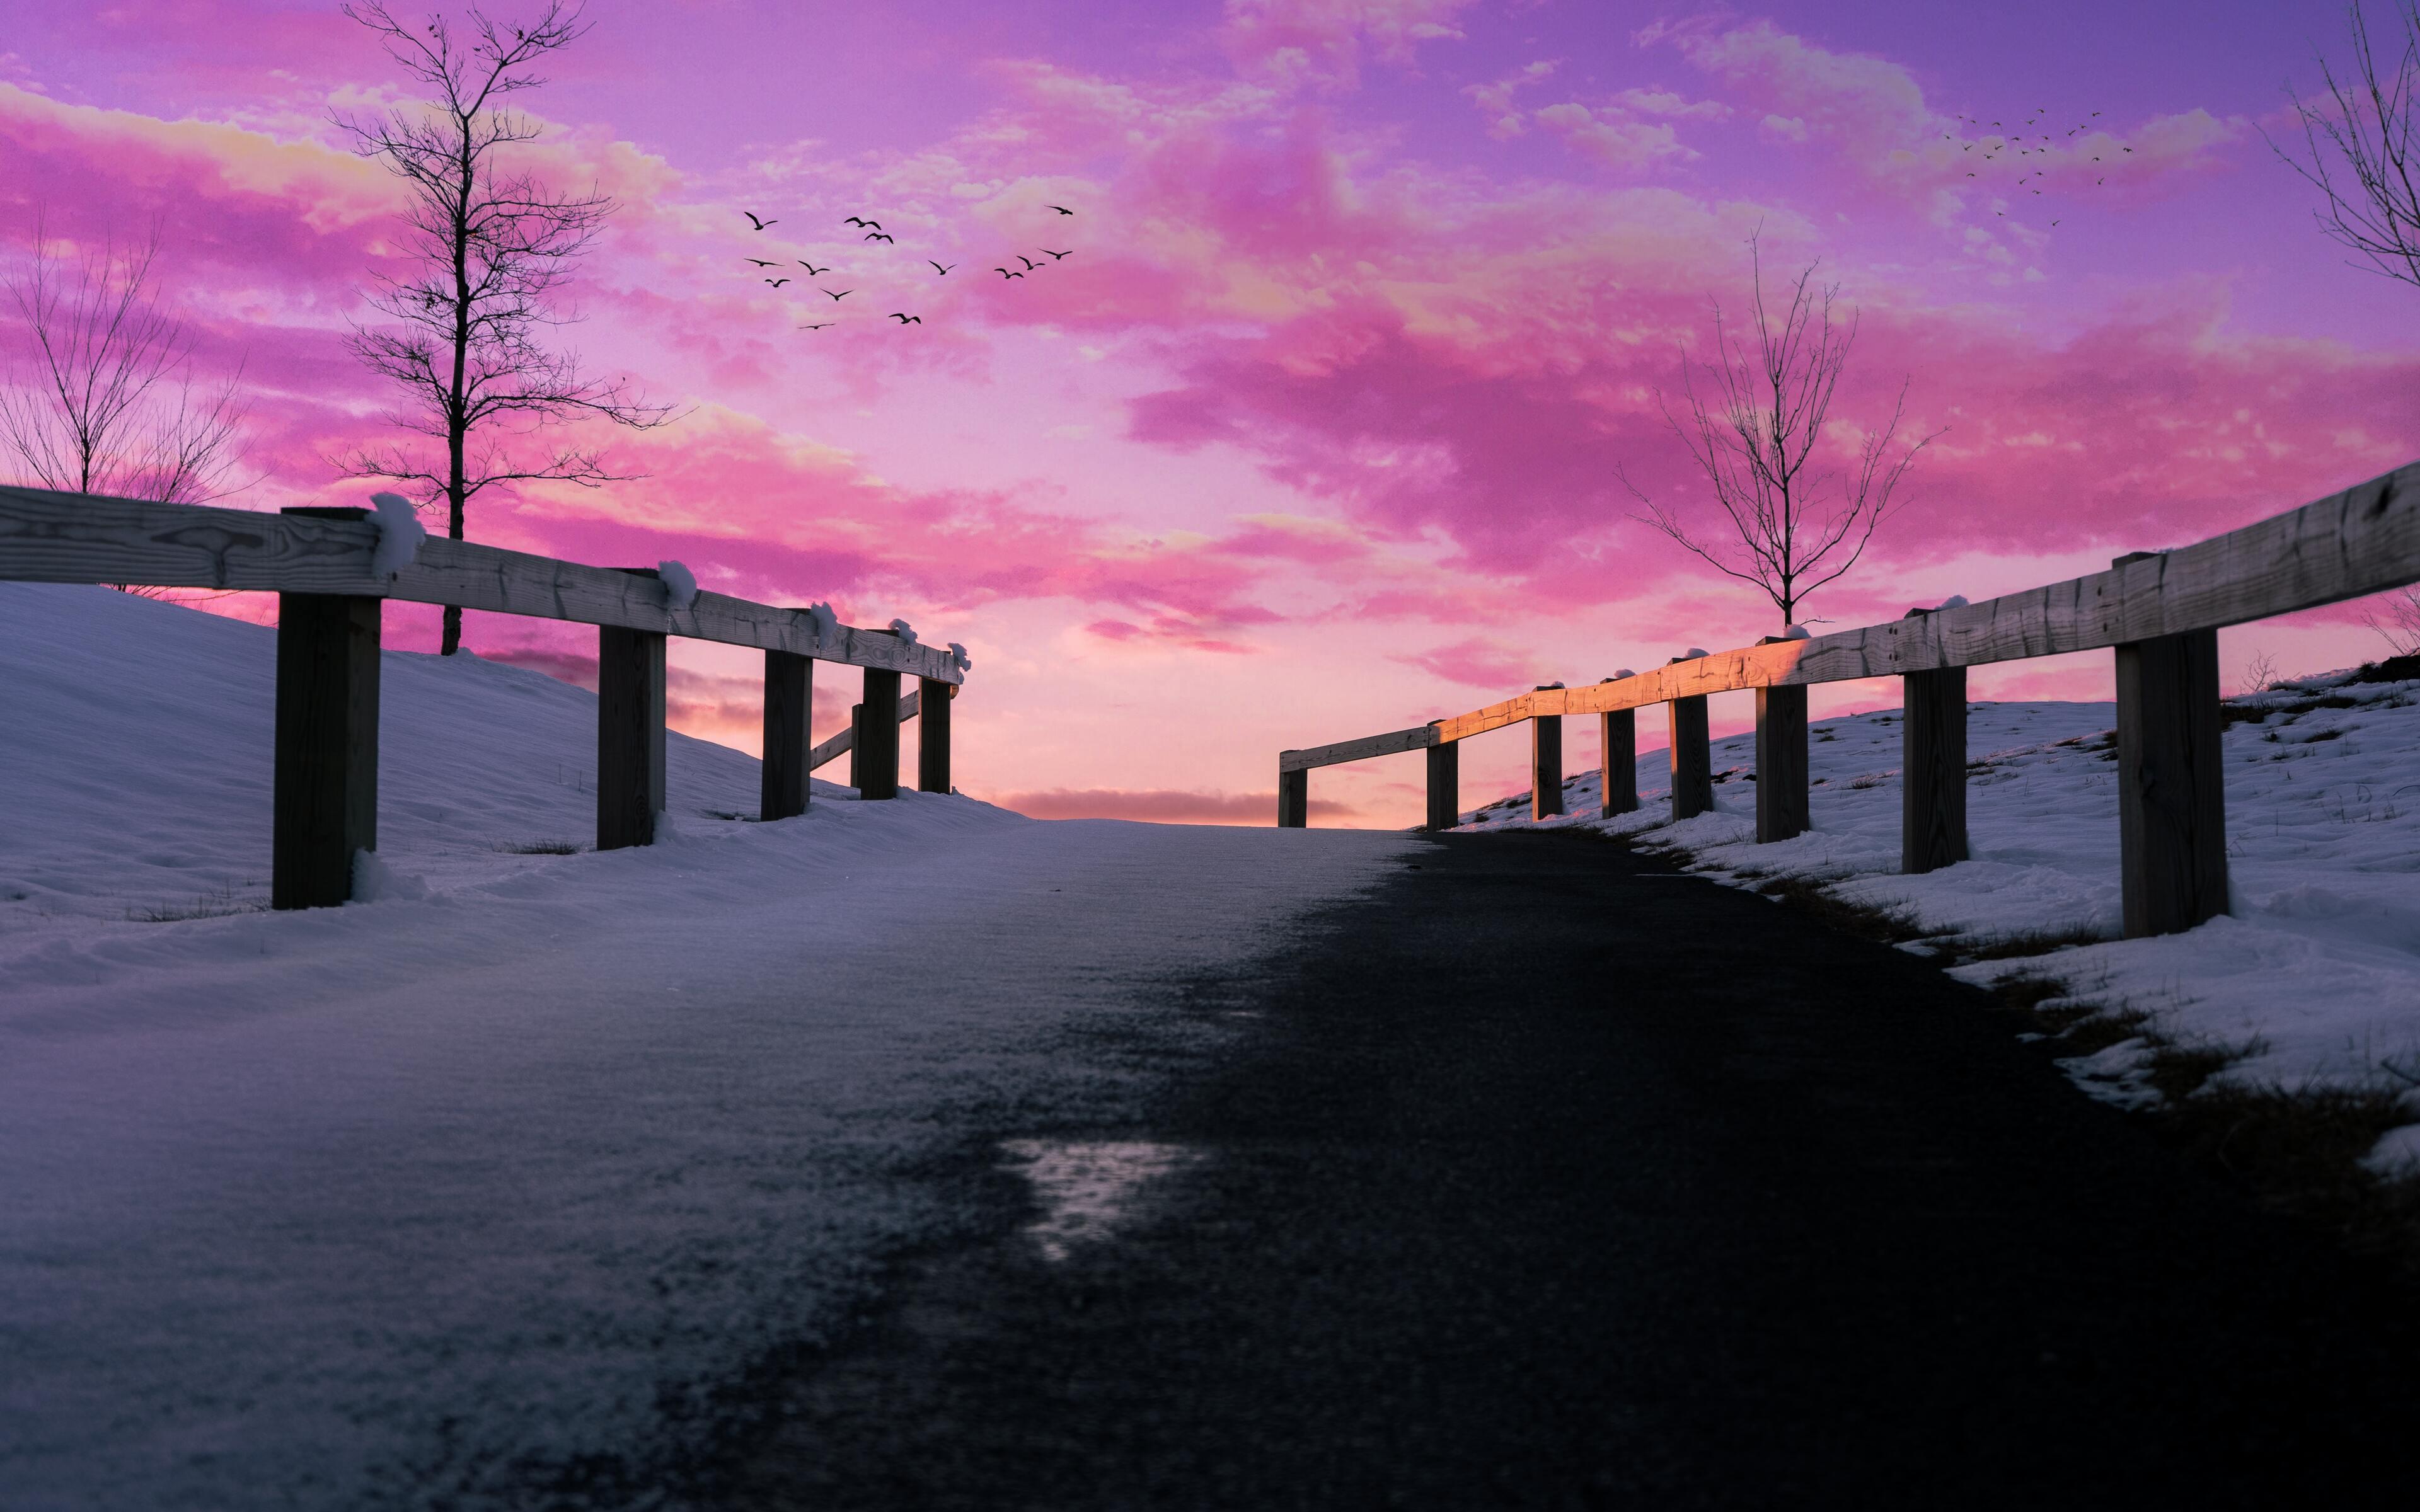 25 Best Of Aesthetic Pink Desktop Background Hd Summer Background